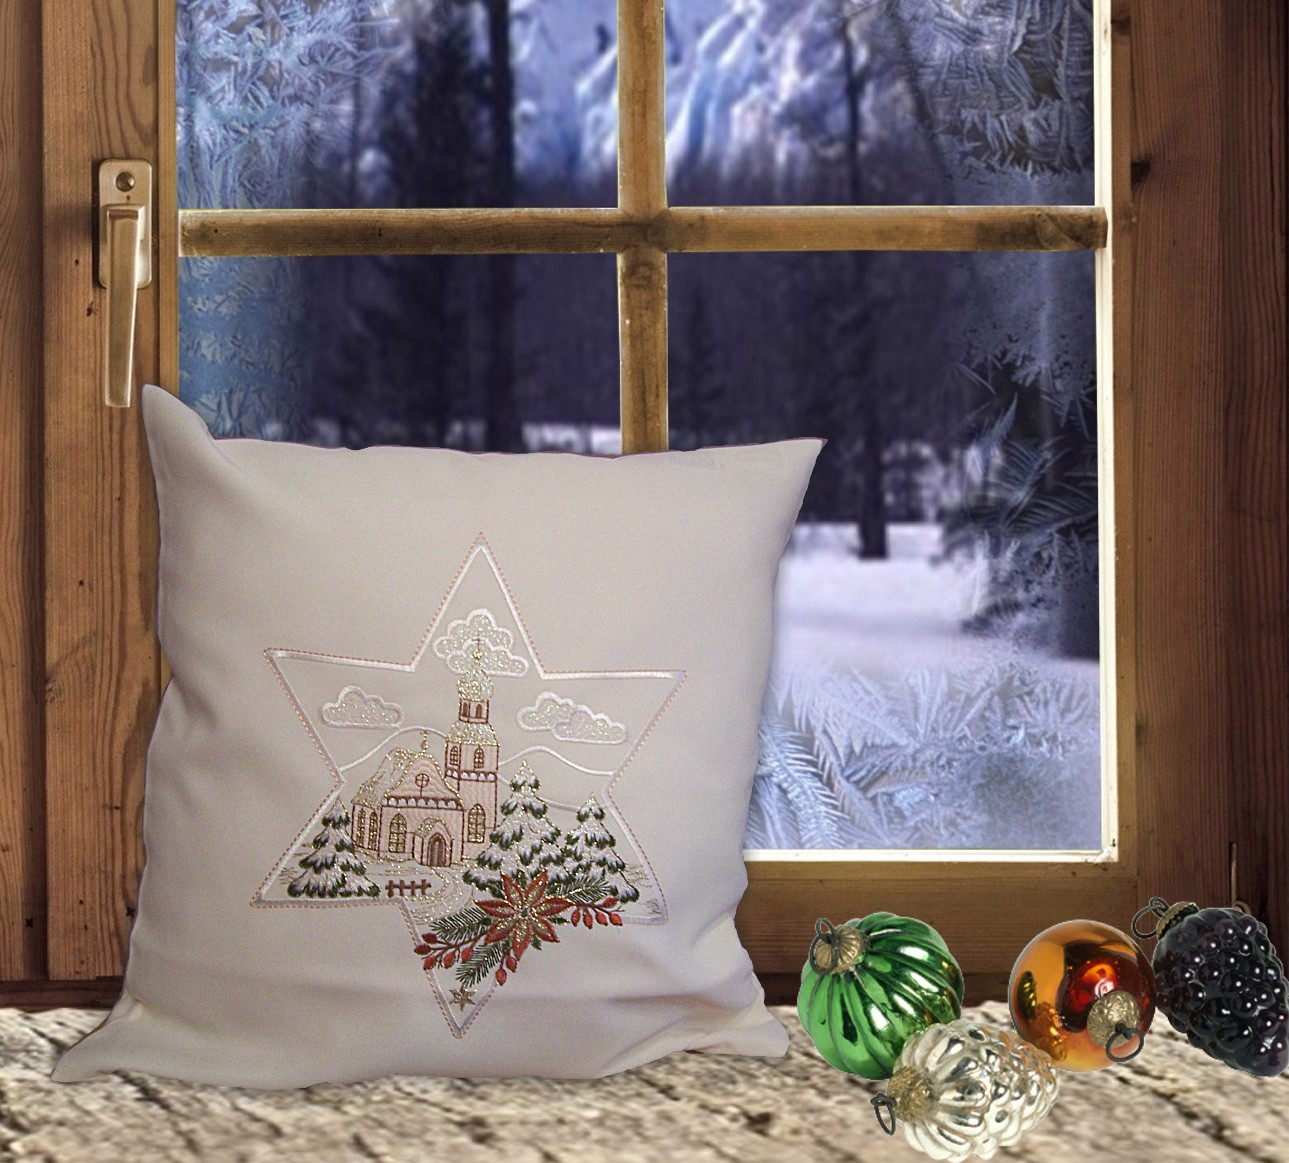 gardinen welt online shop kissenh lle kirche 40 x 40 cm weihnachtsdeko. Black Bedroom Furniture Sets. Home Design Ideas